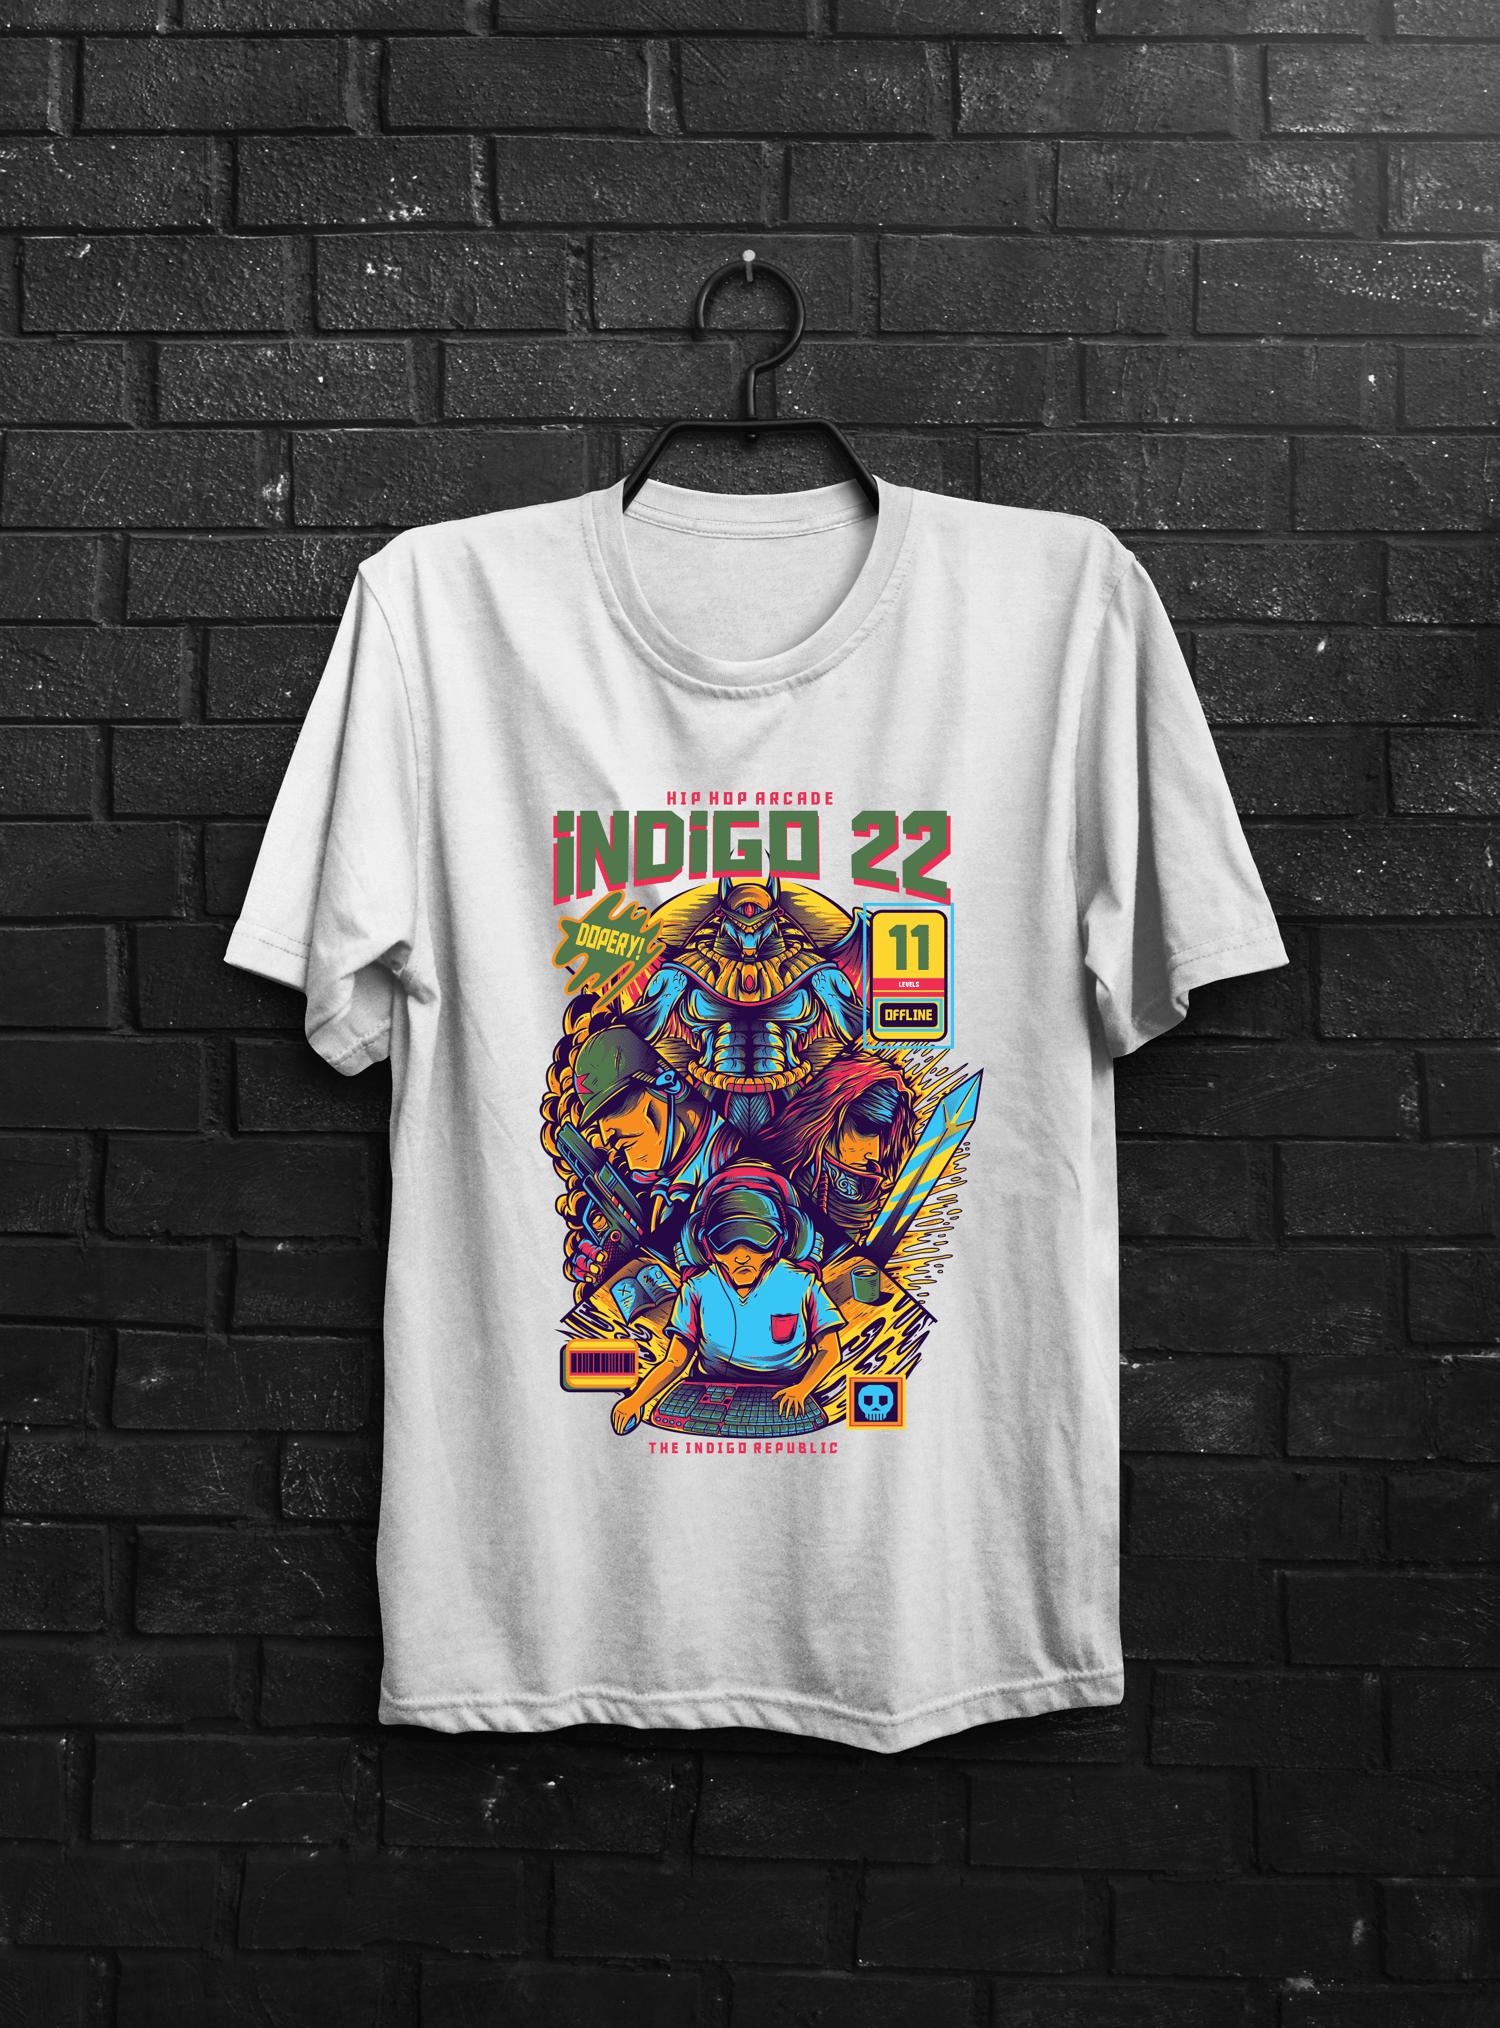 Image of Indigo 22 Arcade Shirt